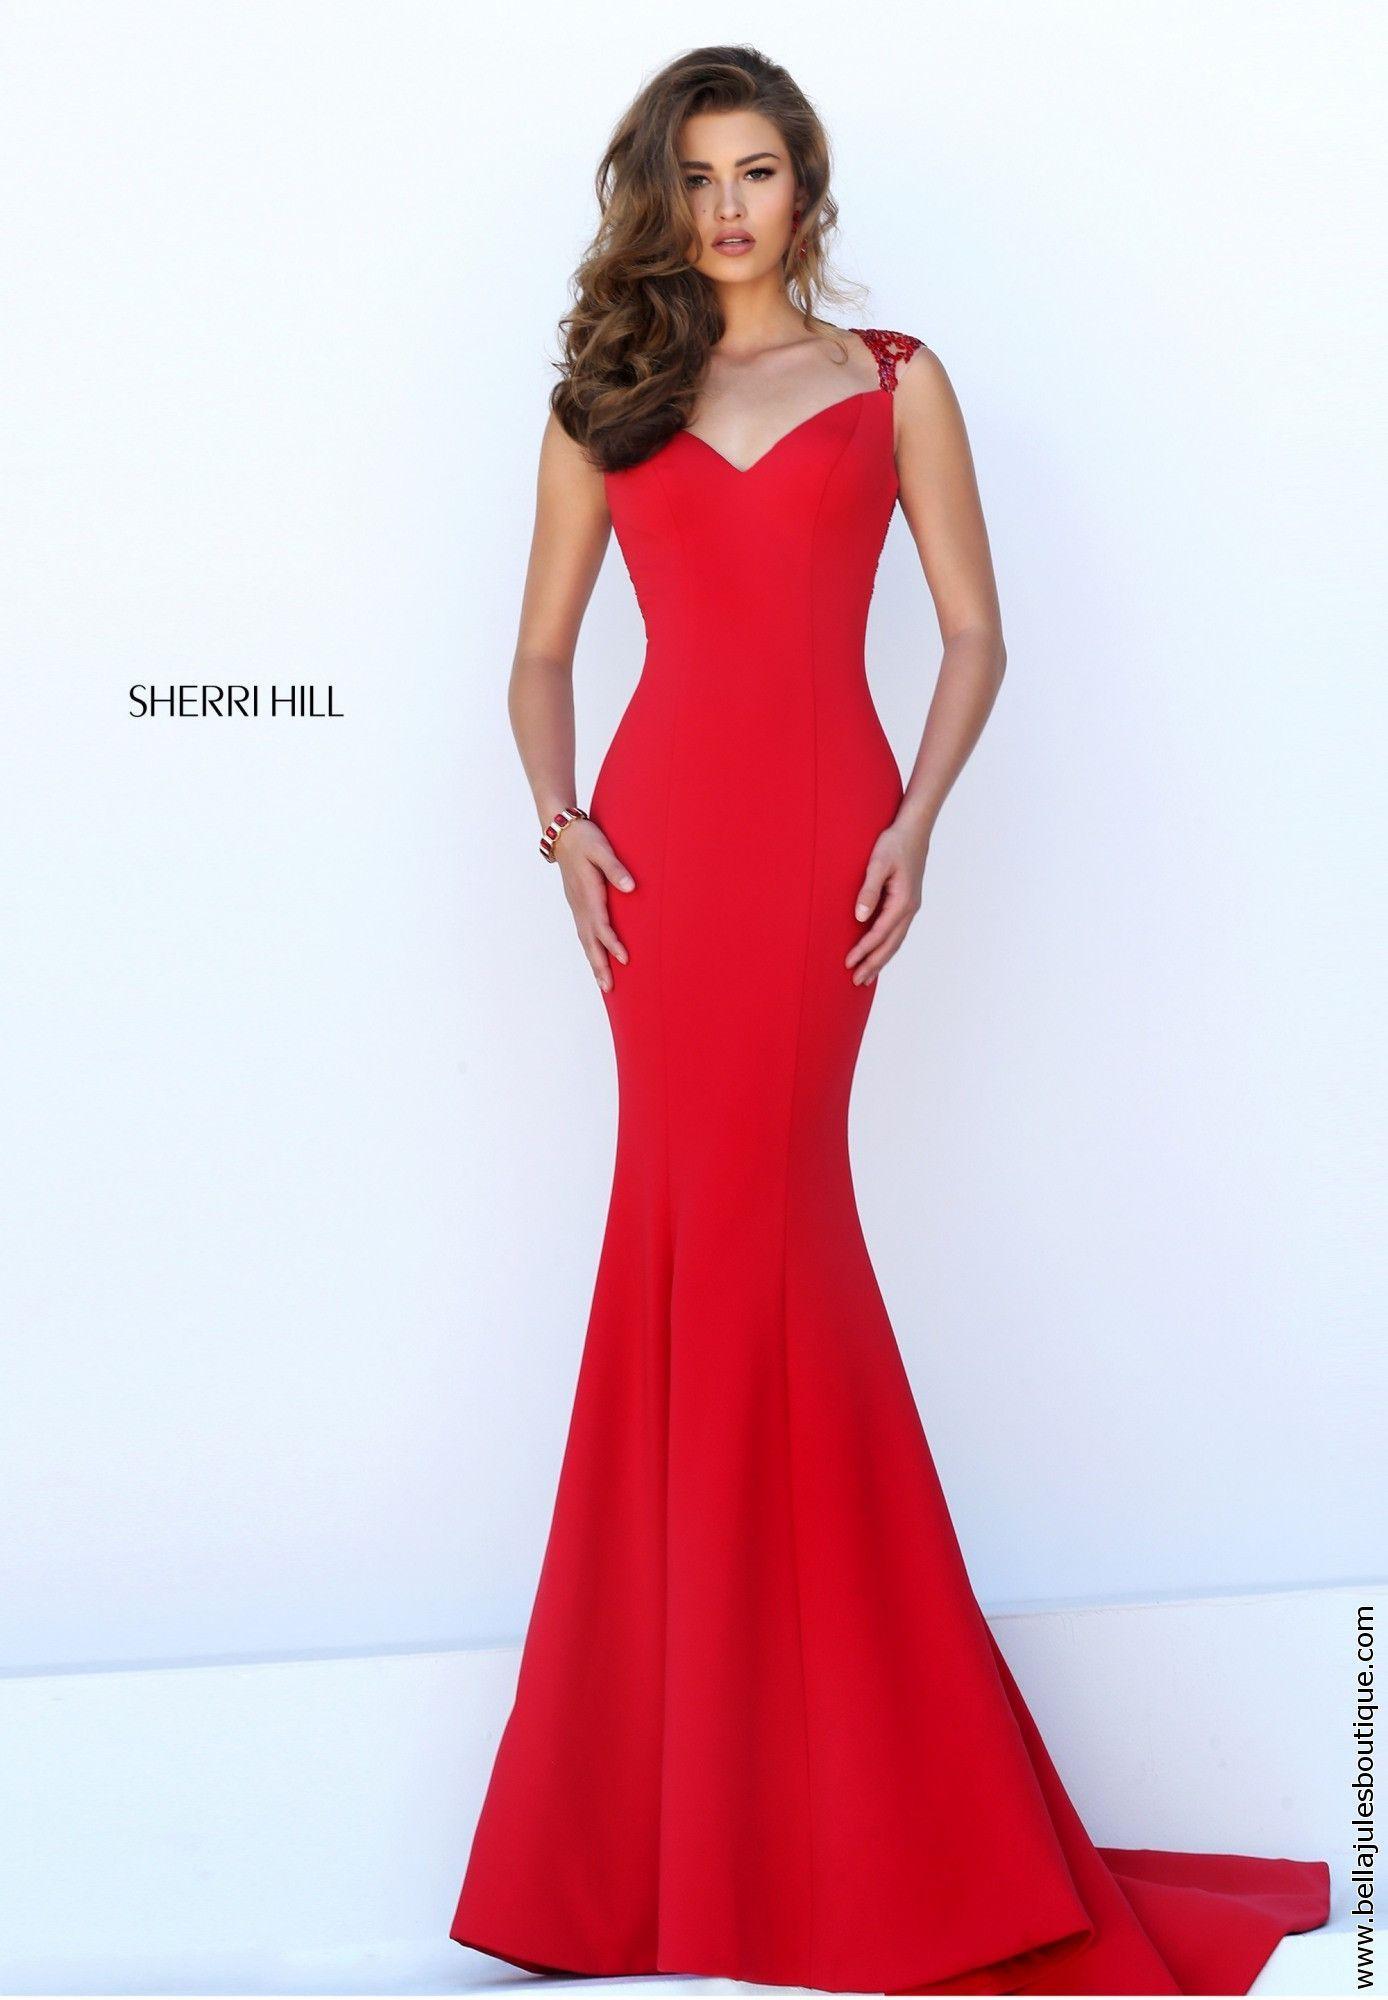 Sherri Hill prom dress style 50241 | Trajes de gala | Pinterest